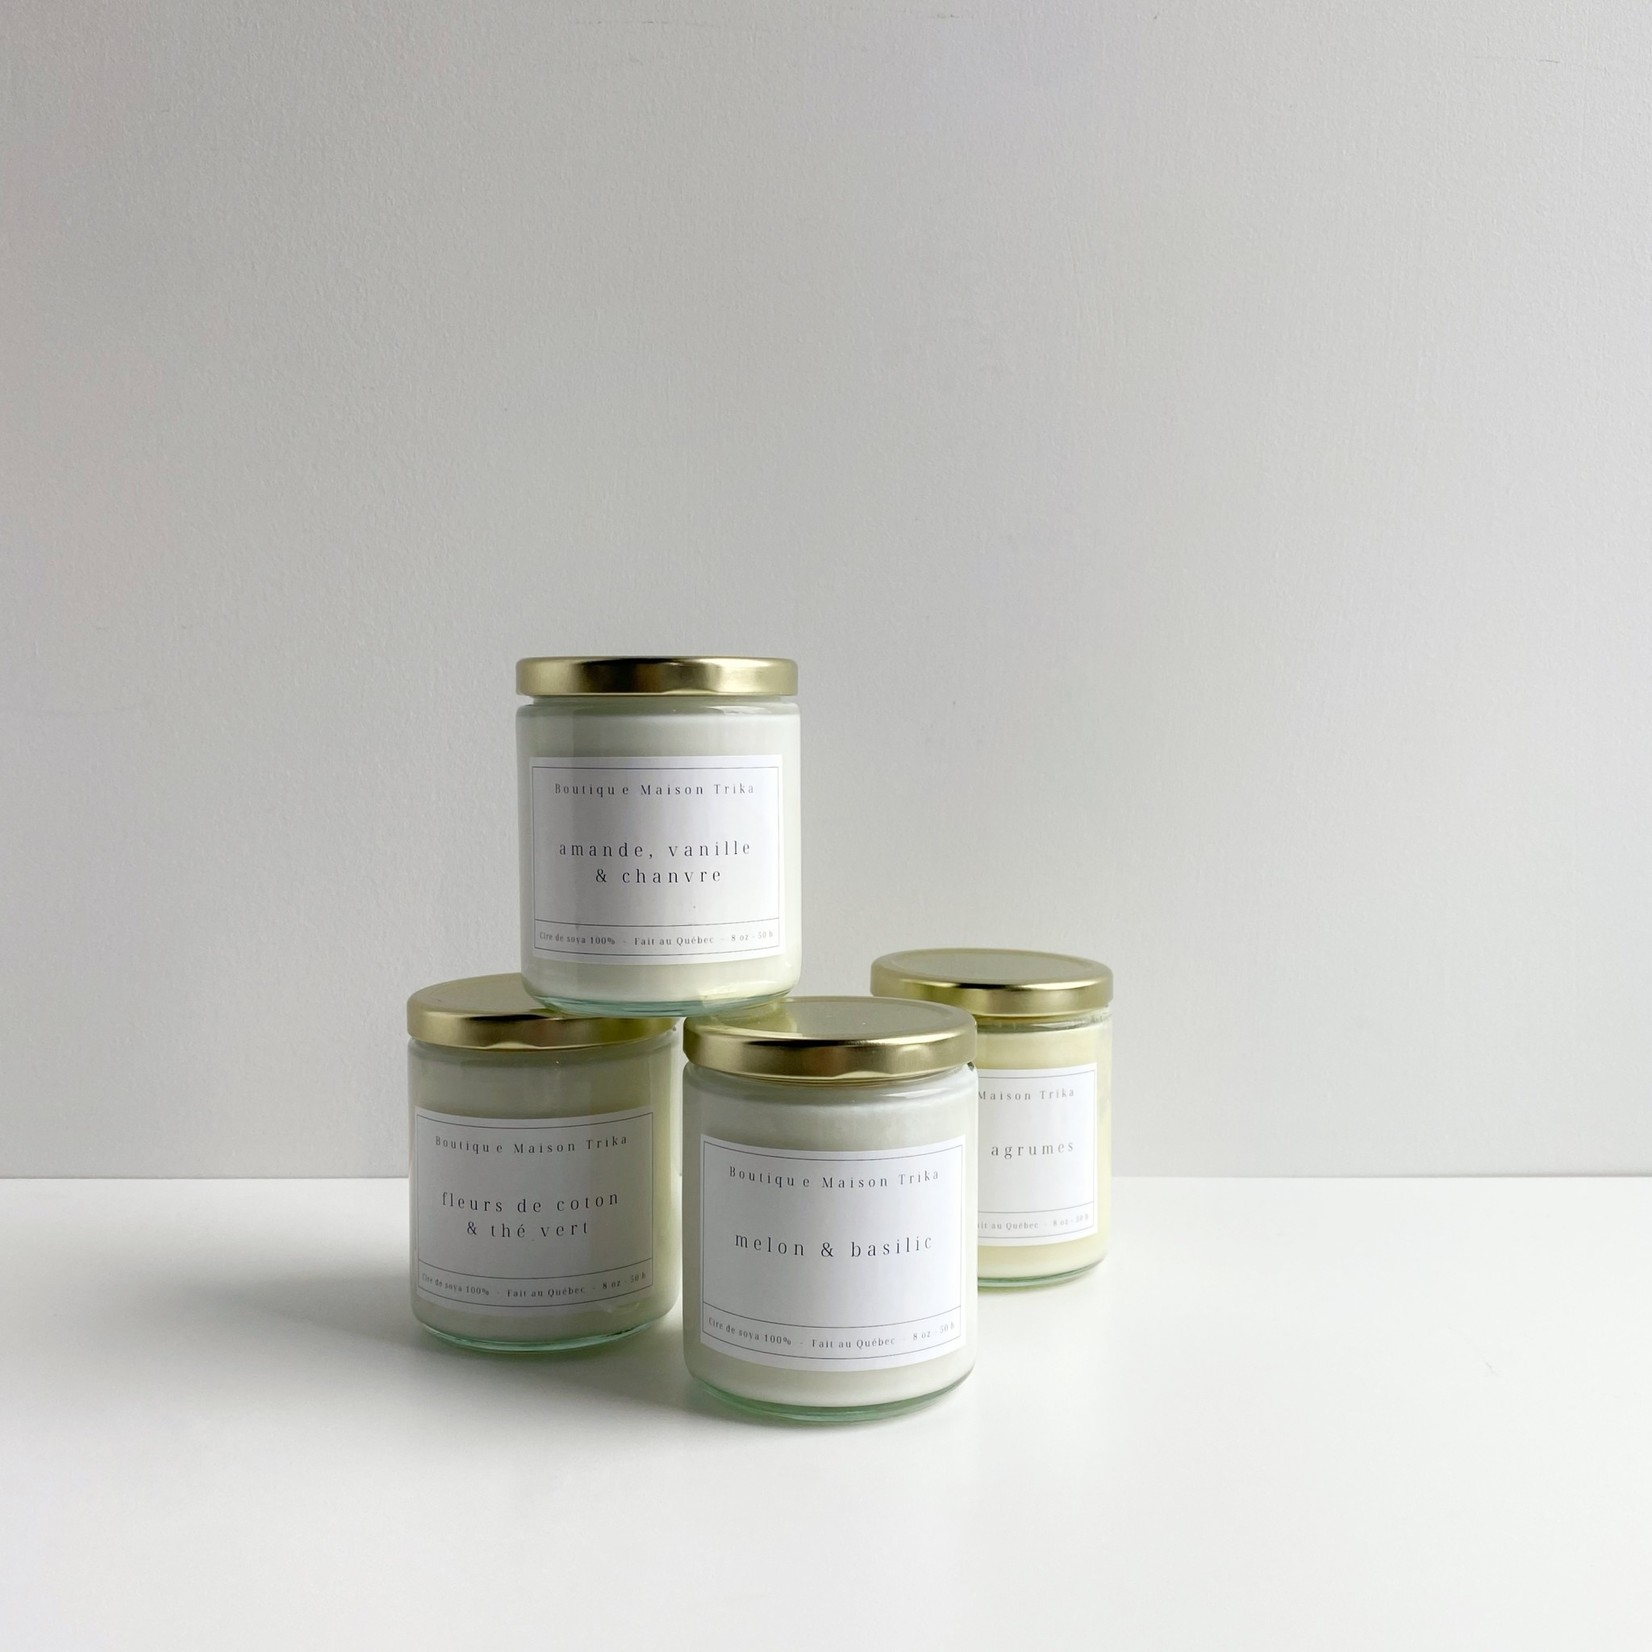 Maison Trika bougie - Pêche & agrumes